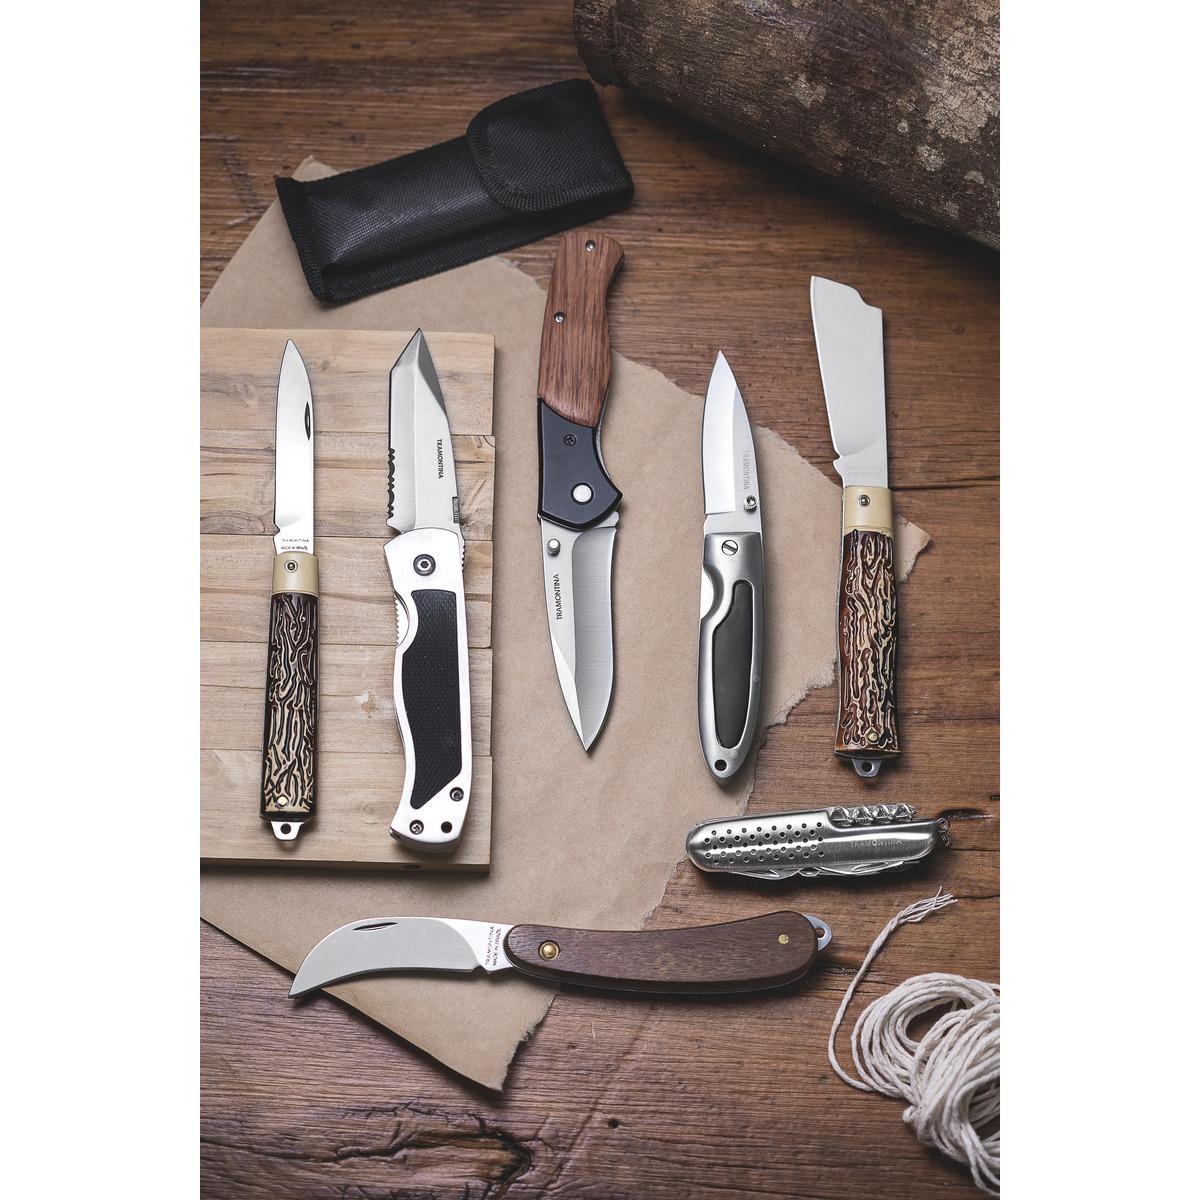 "Canivete com Lâmina Inox e Cabo ABS 3"" Tramontina 26300/003"